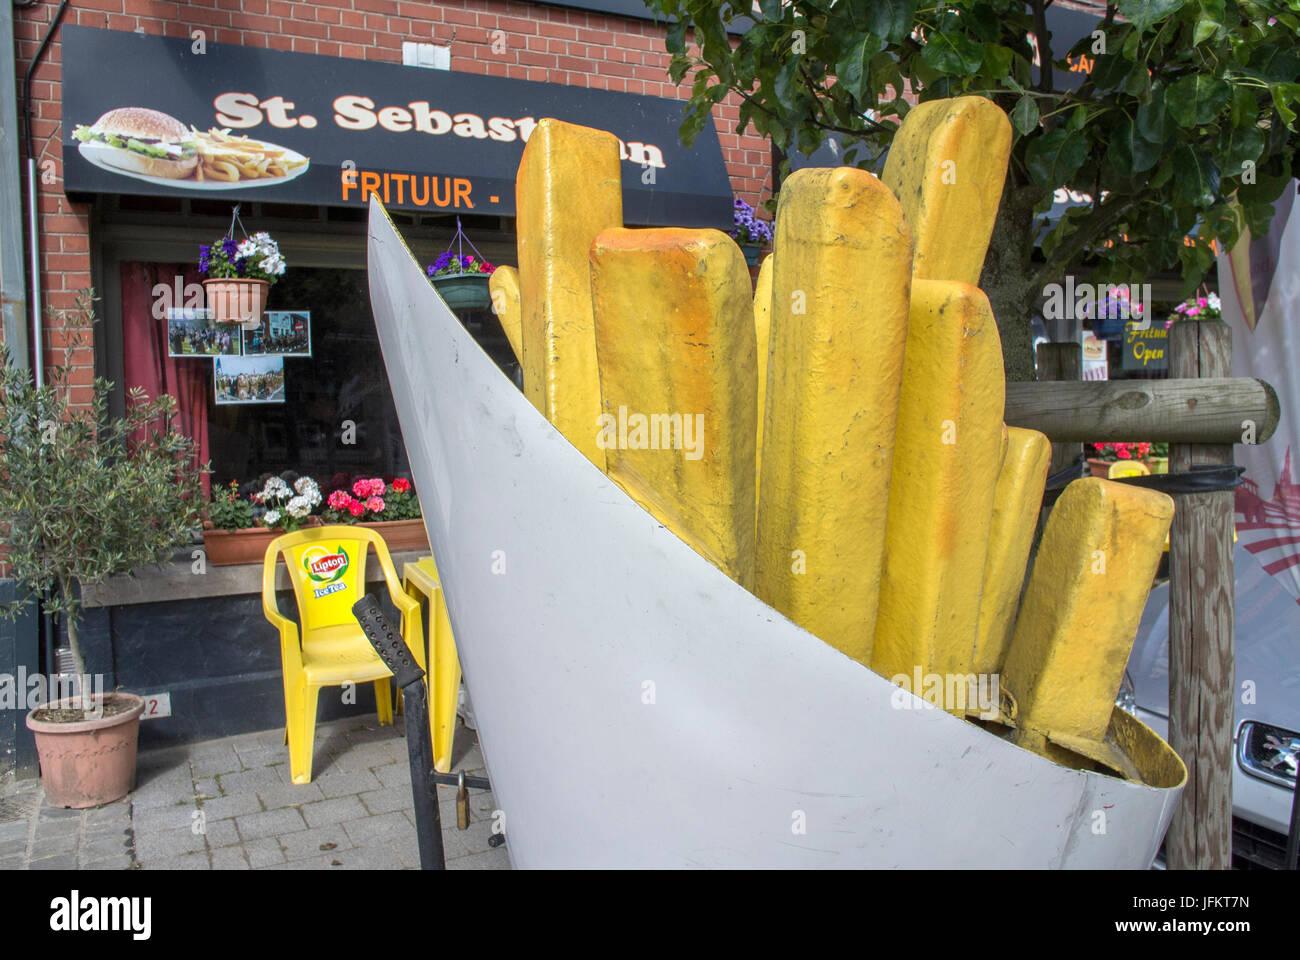 A food shop in Messines, West Flanders, Belgium. - Stock Image